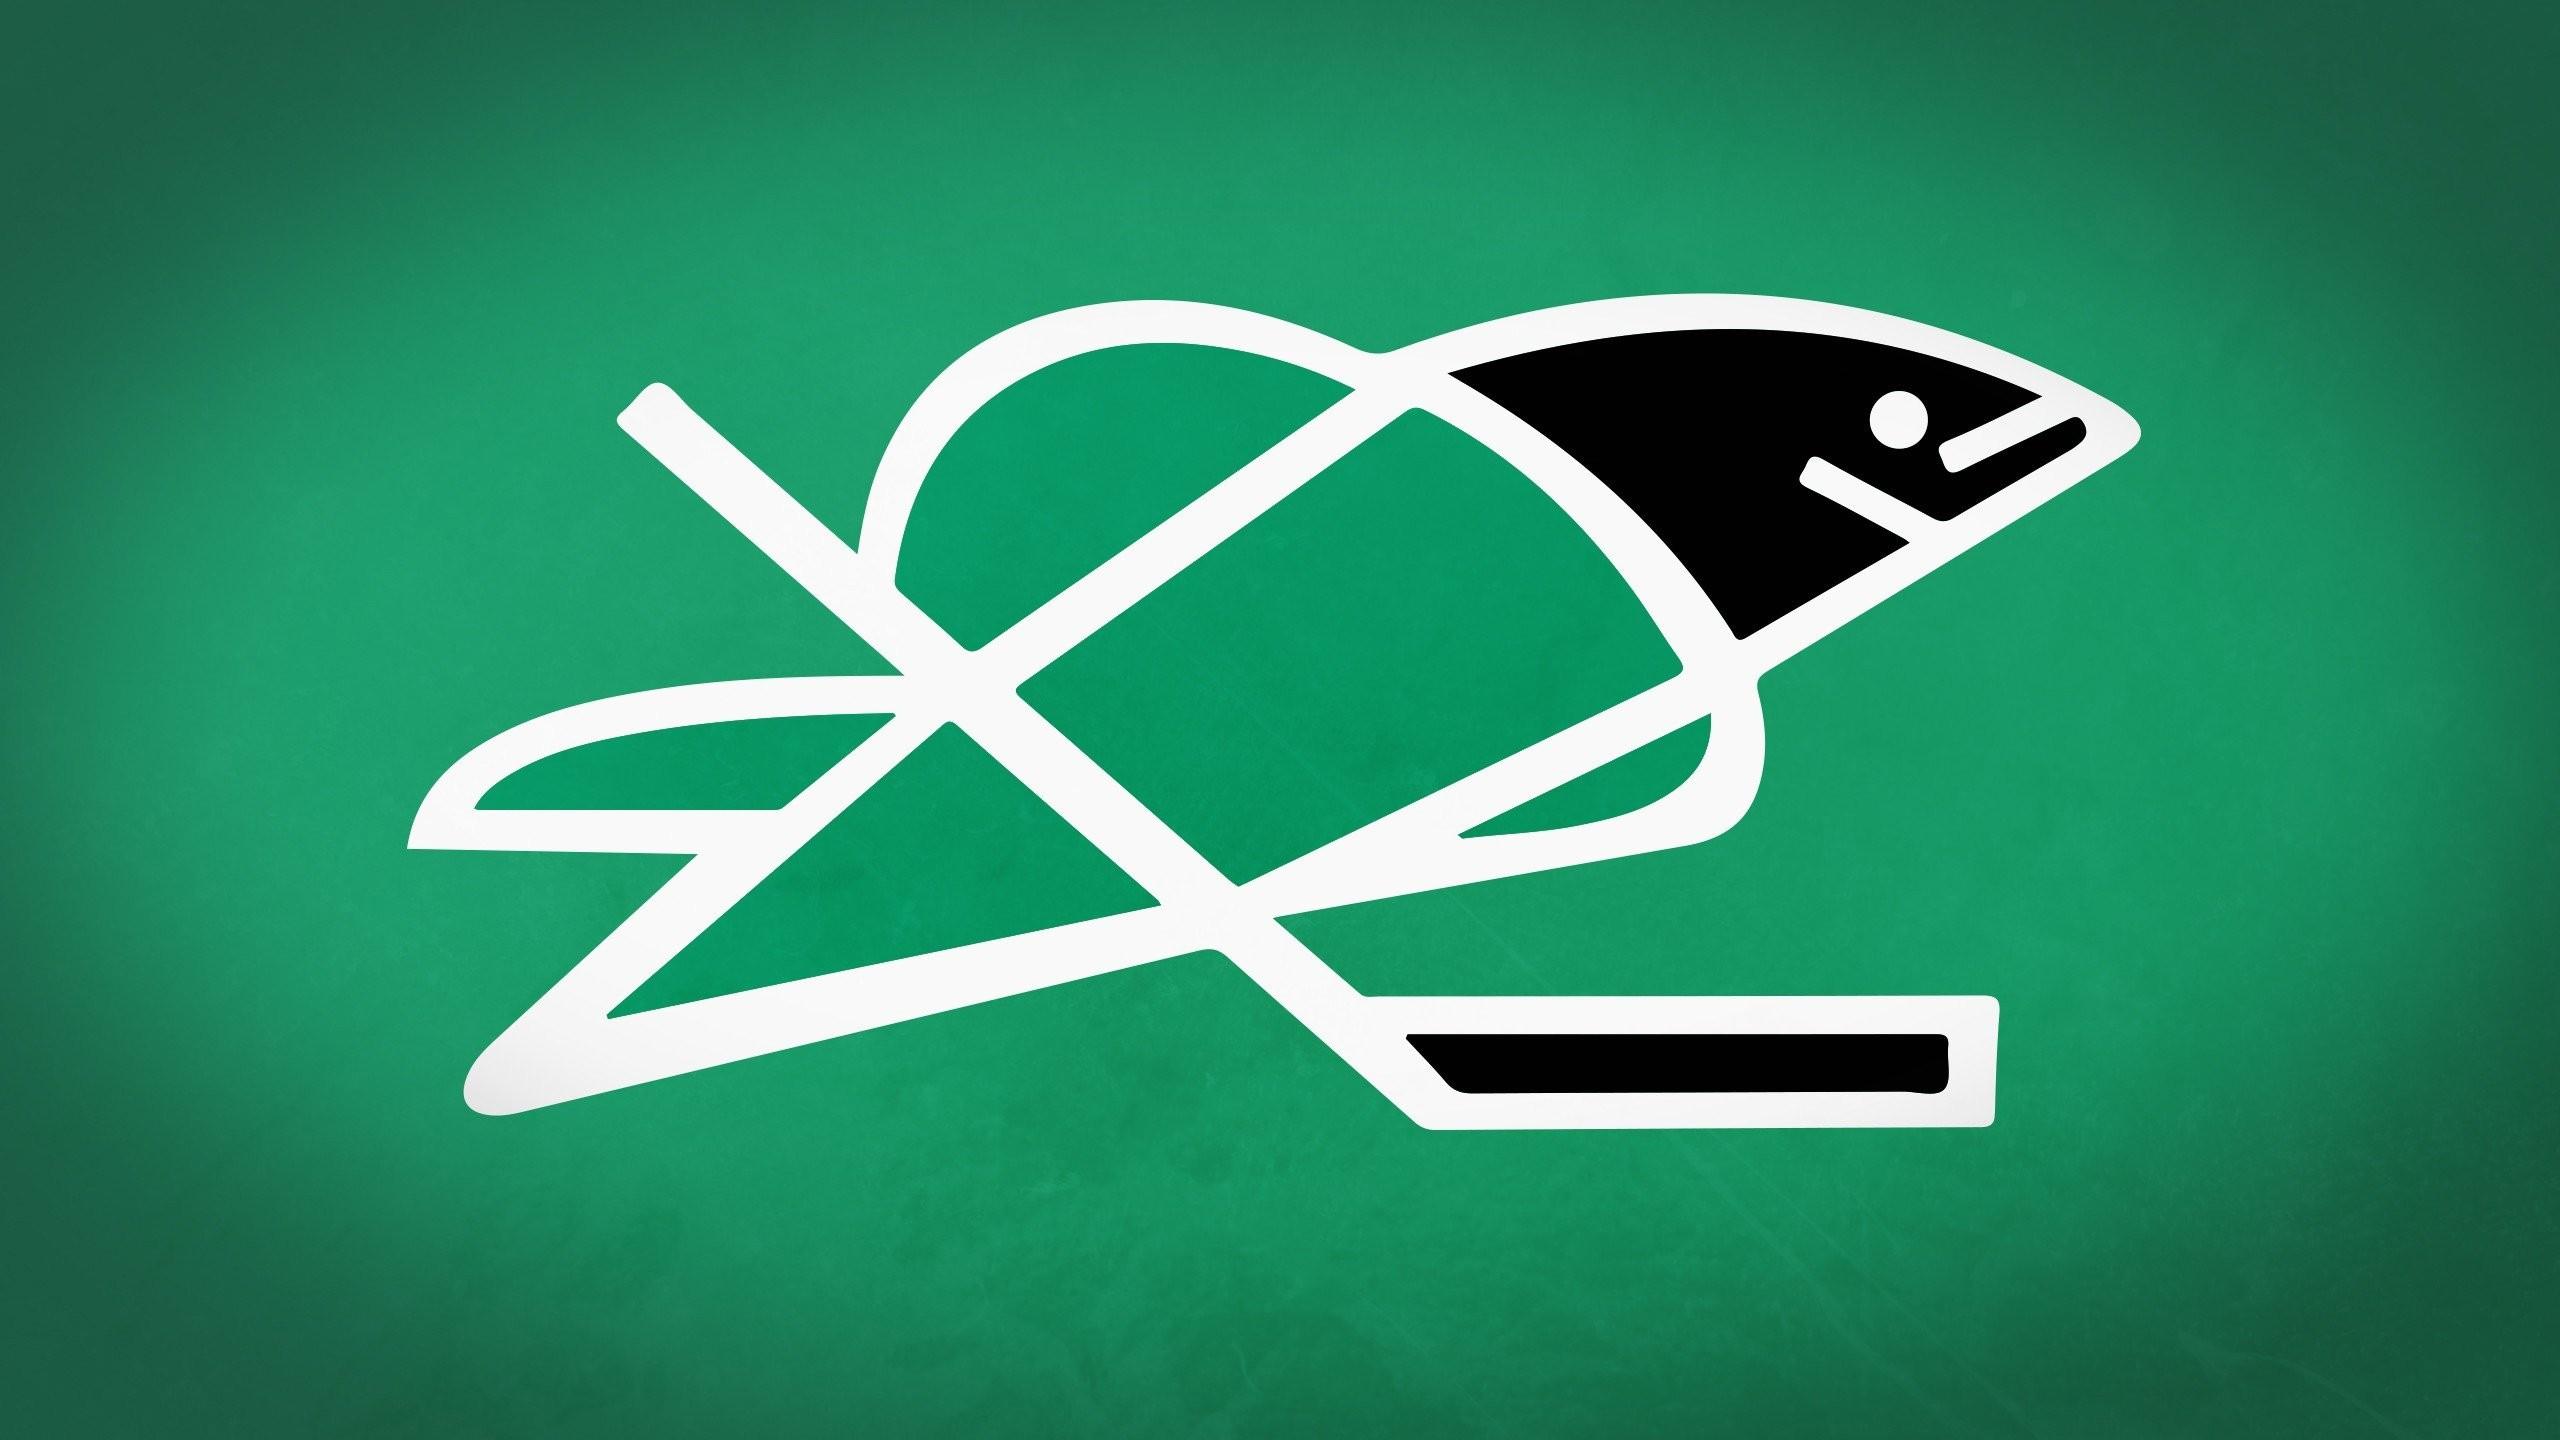 … wallpapers pittsburgh penguins; hockey logos minimalistic nhl penguins  pittsburgh simple sports …